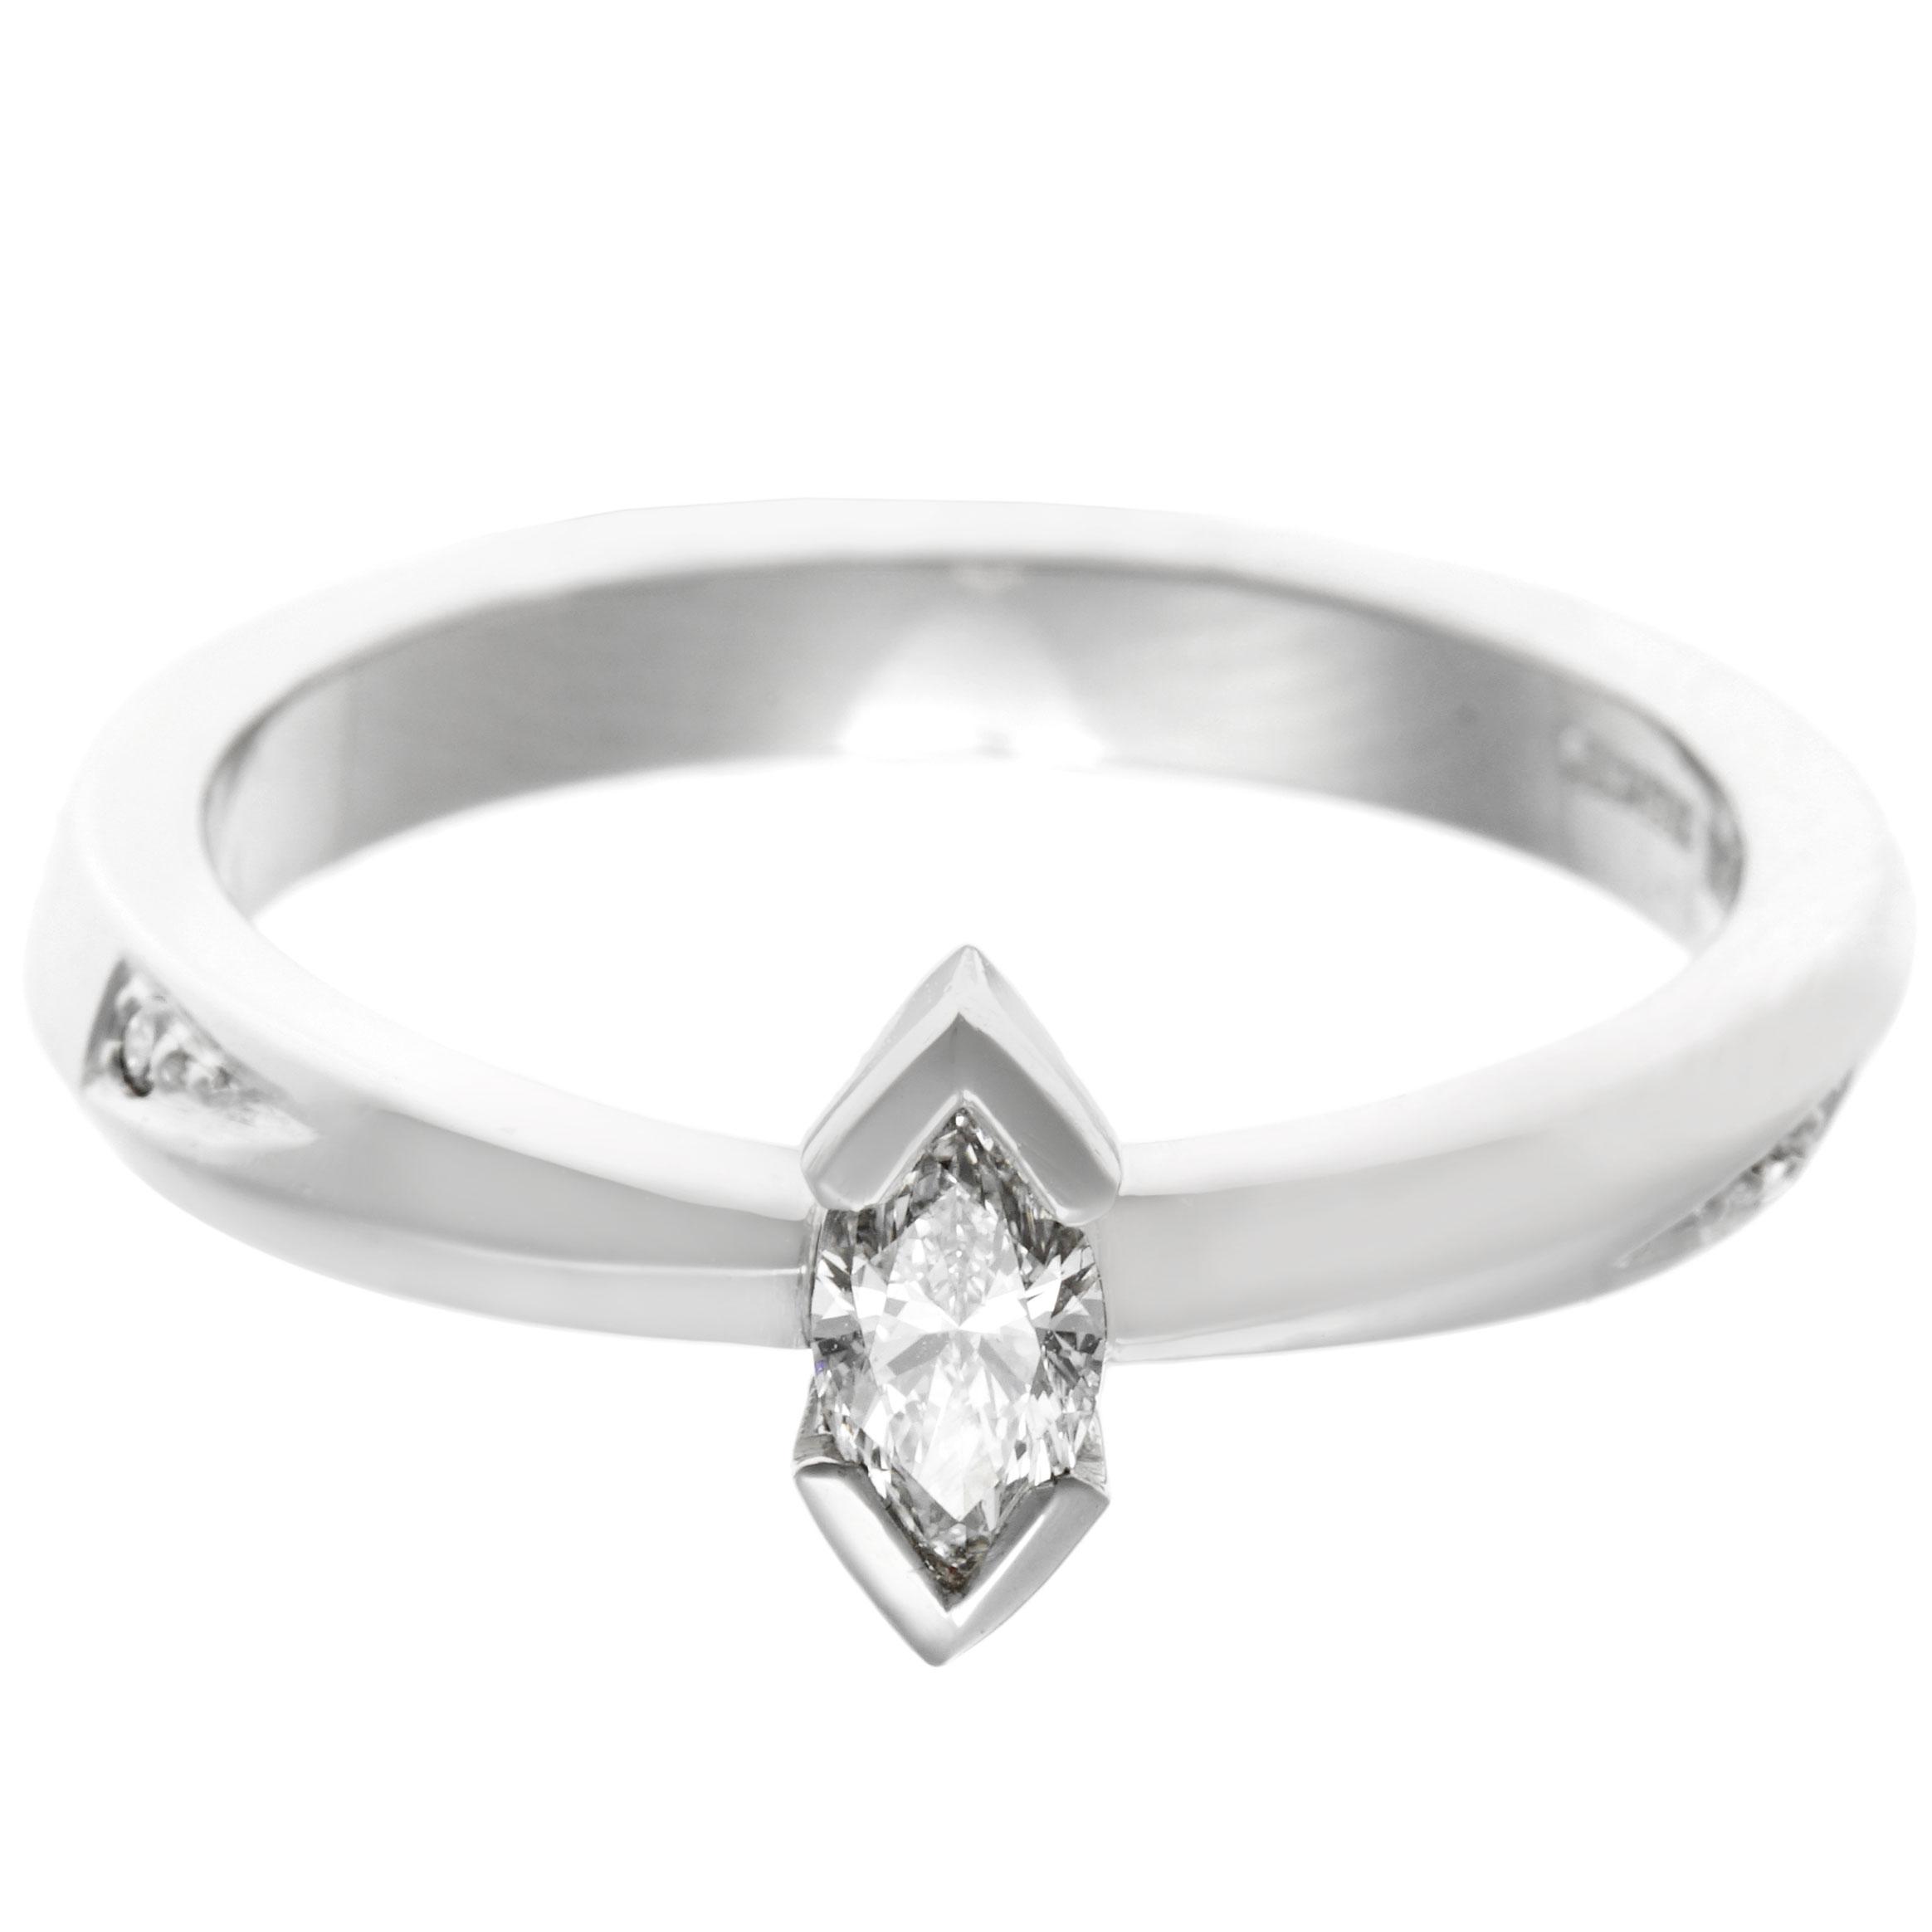 17639-palladium-marquise-cut-diamond-with-apex-profile_6.jpg